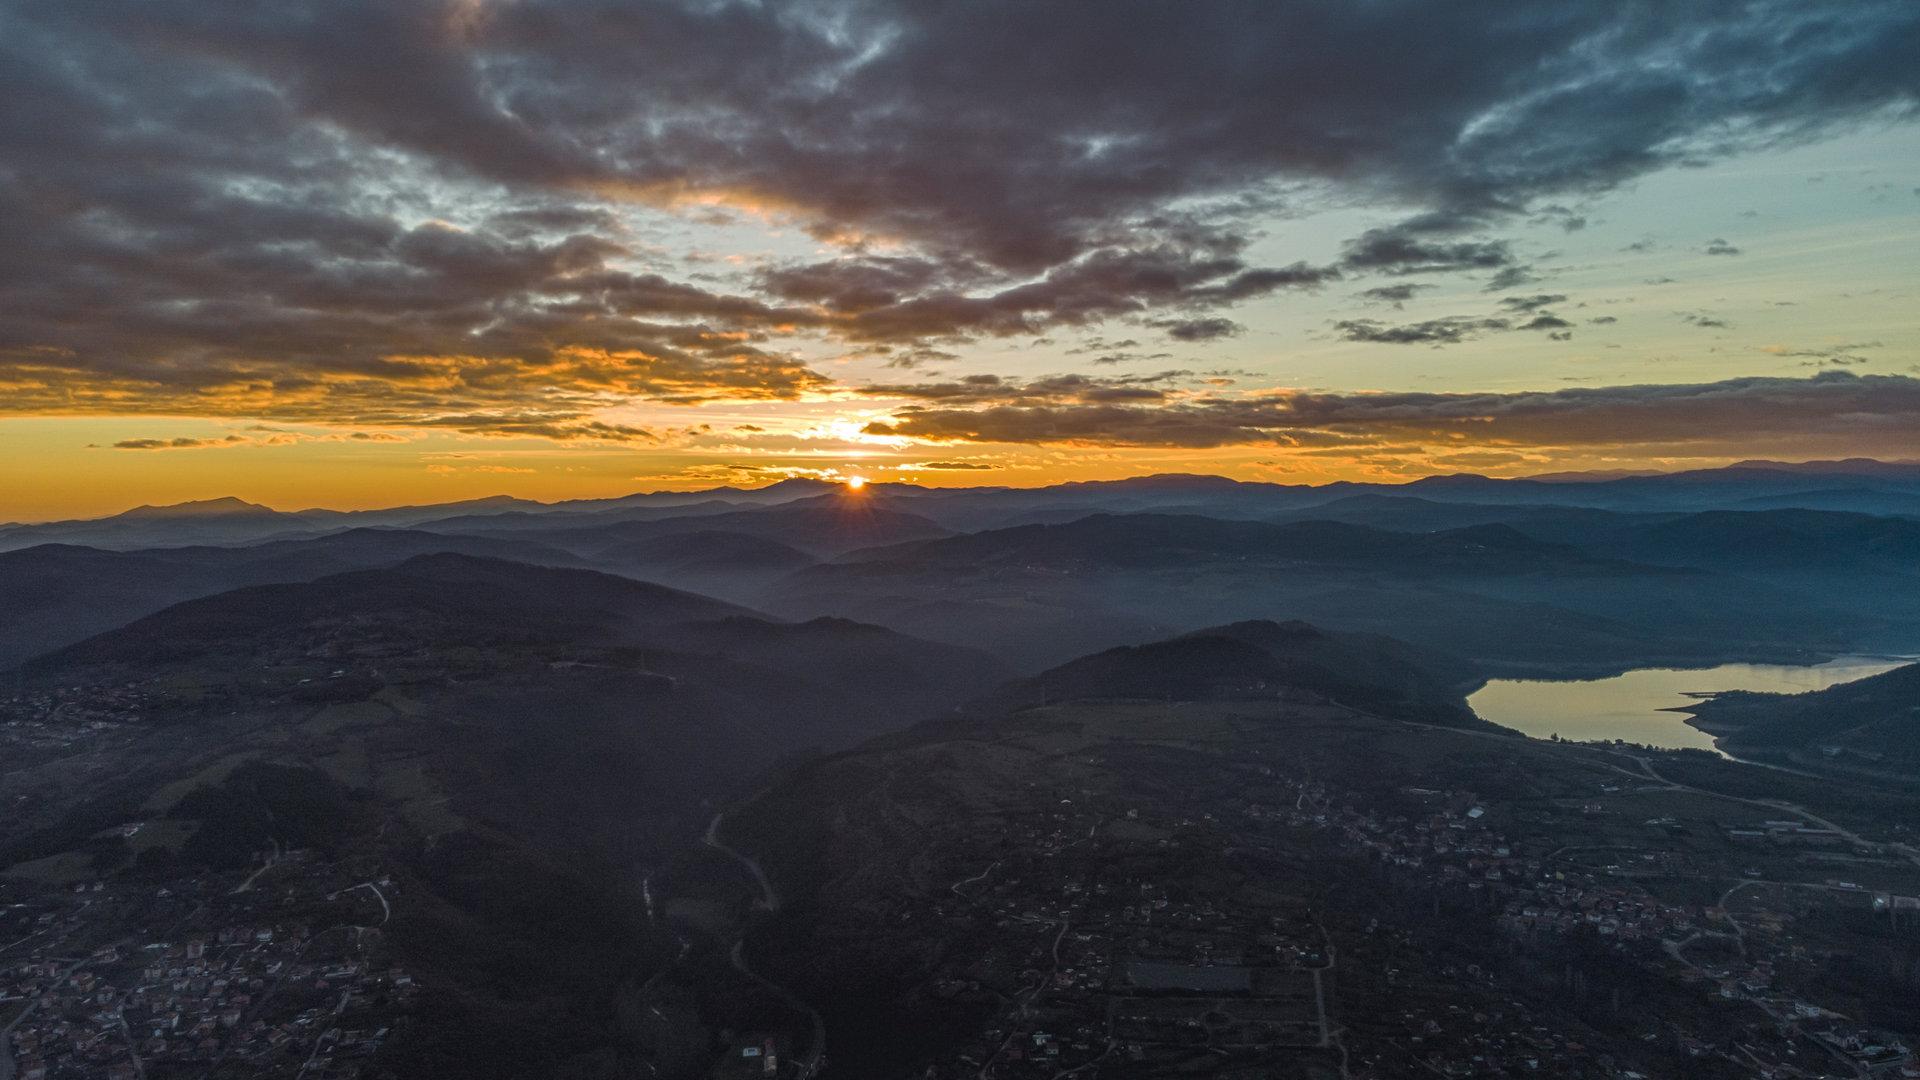 Photo in Aerial | Author Kamenow | PHOTO FORUM